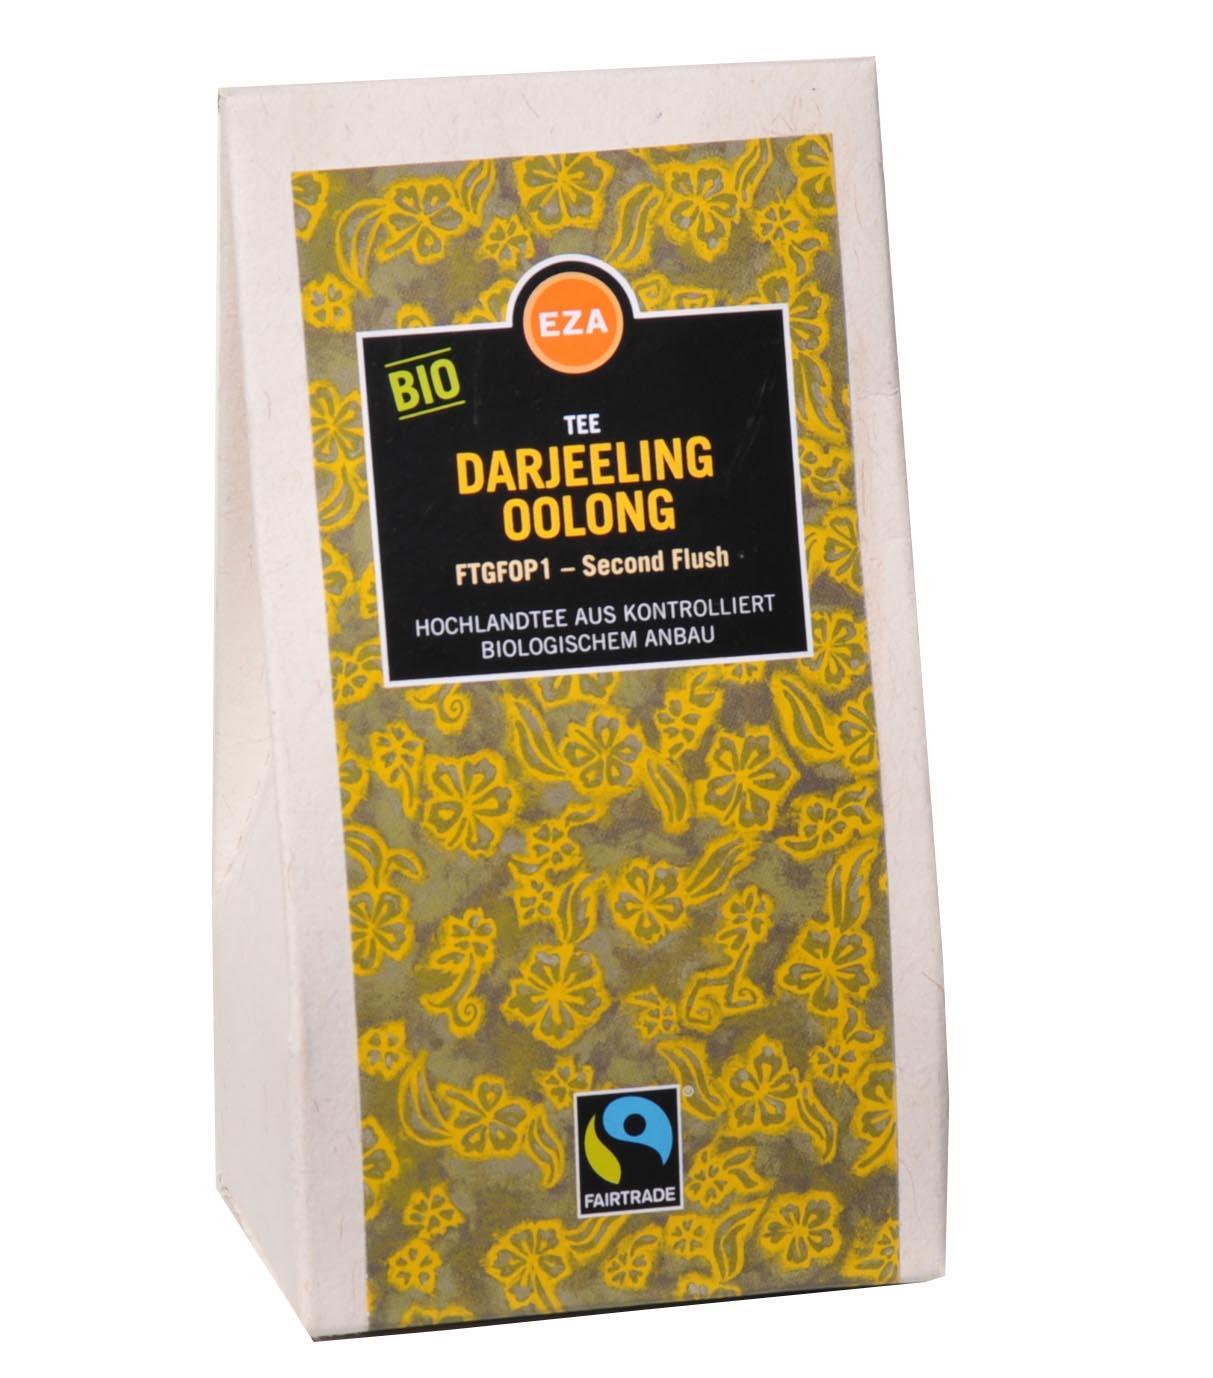 Darjeeling Oolong